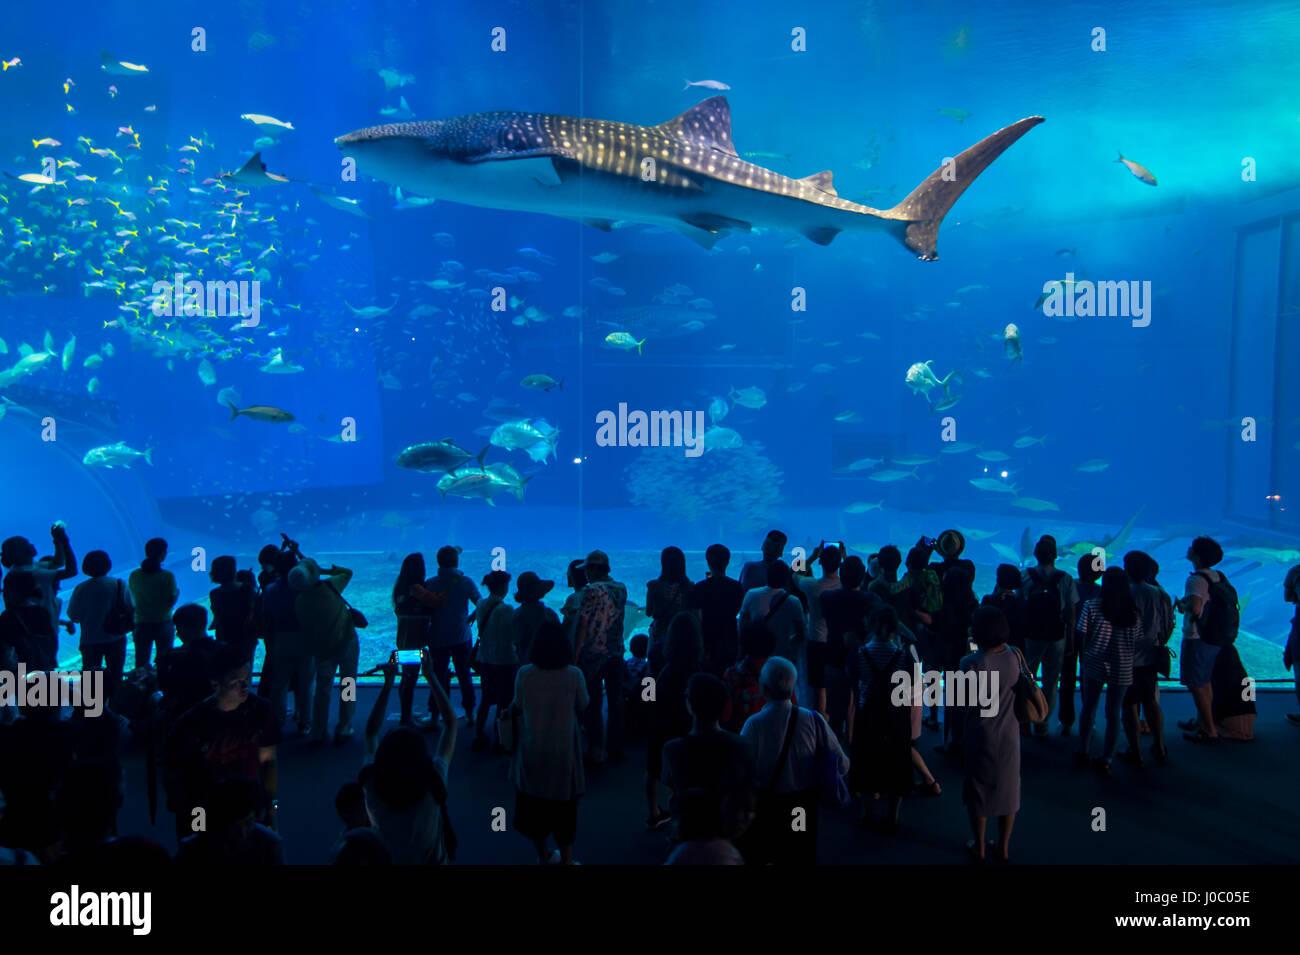 Whaleshark in the Churaumi Aquarium, Ocean Expo Park, Okinawa, Japan, Asia - Stock Image